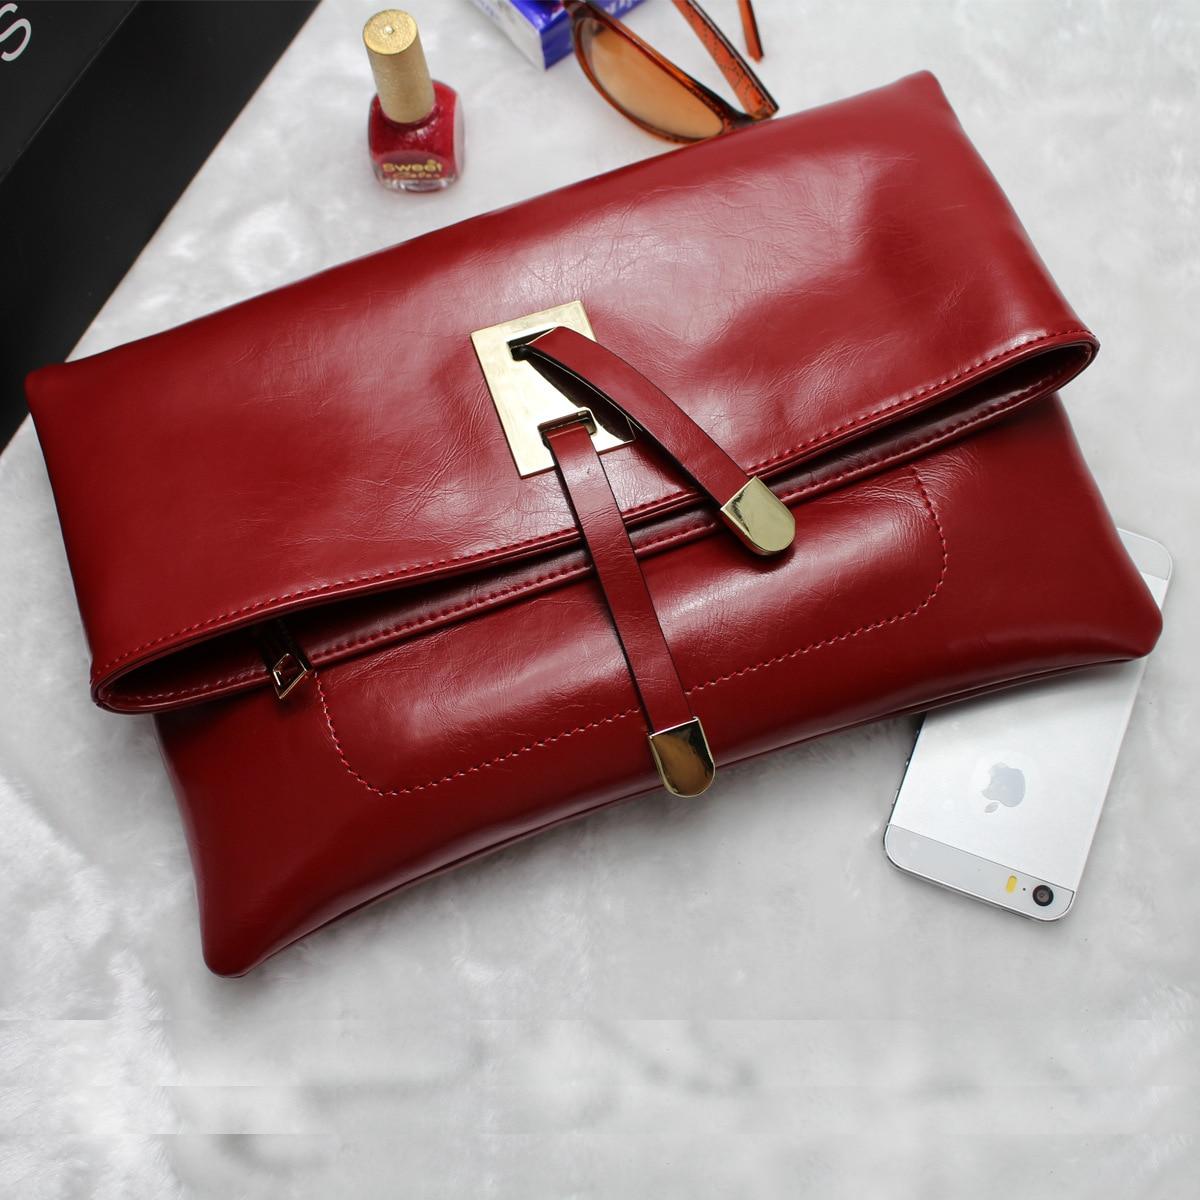 2017 New Famous Brand Oil Wax Genuine Leather Ladies Vintage Evening Bag Girl Day Clutch Hand Bag Women Shoulders Messenger Bag